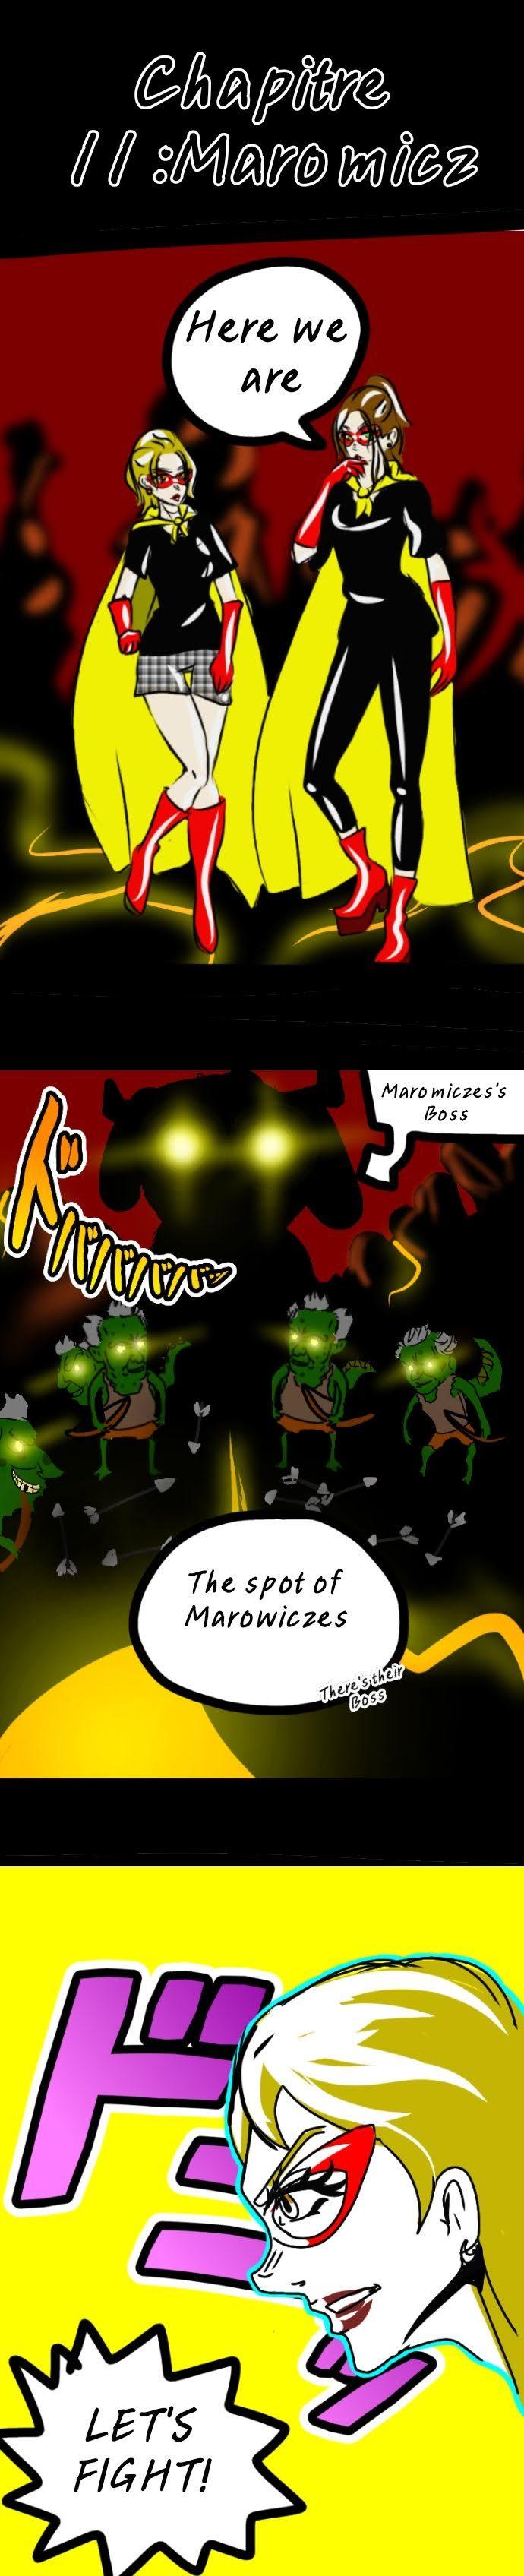 https://img2.nineanime.com/comics/pic3/2/38274/1491837/3e517f740a205531302fa9a026864bfa.jpg Page 1